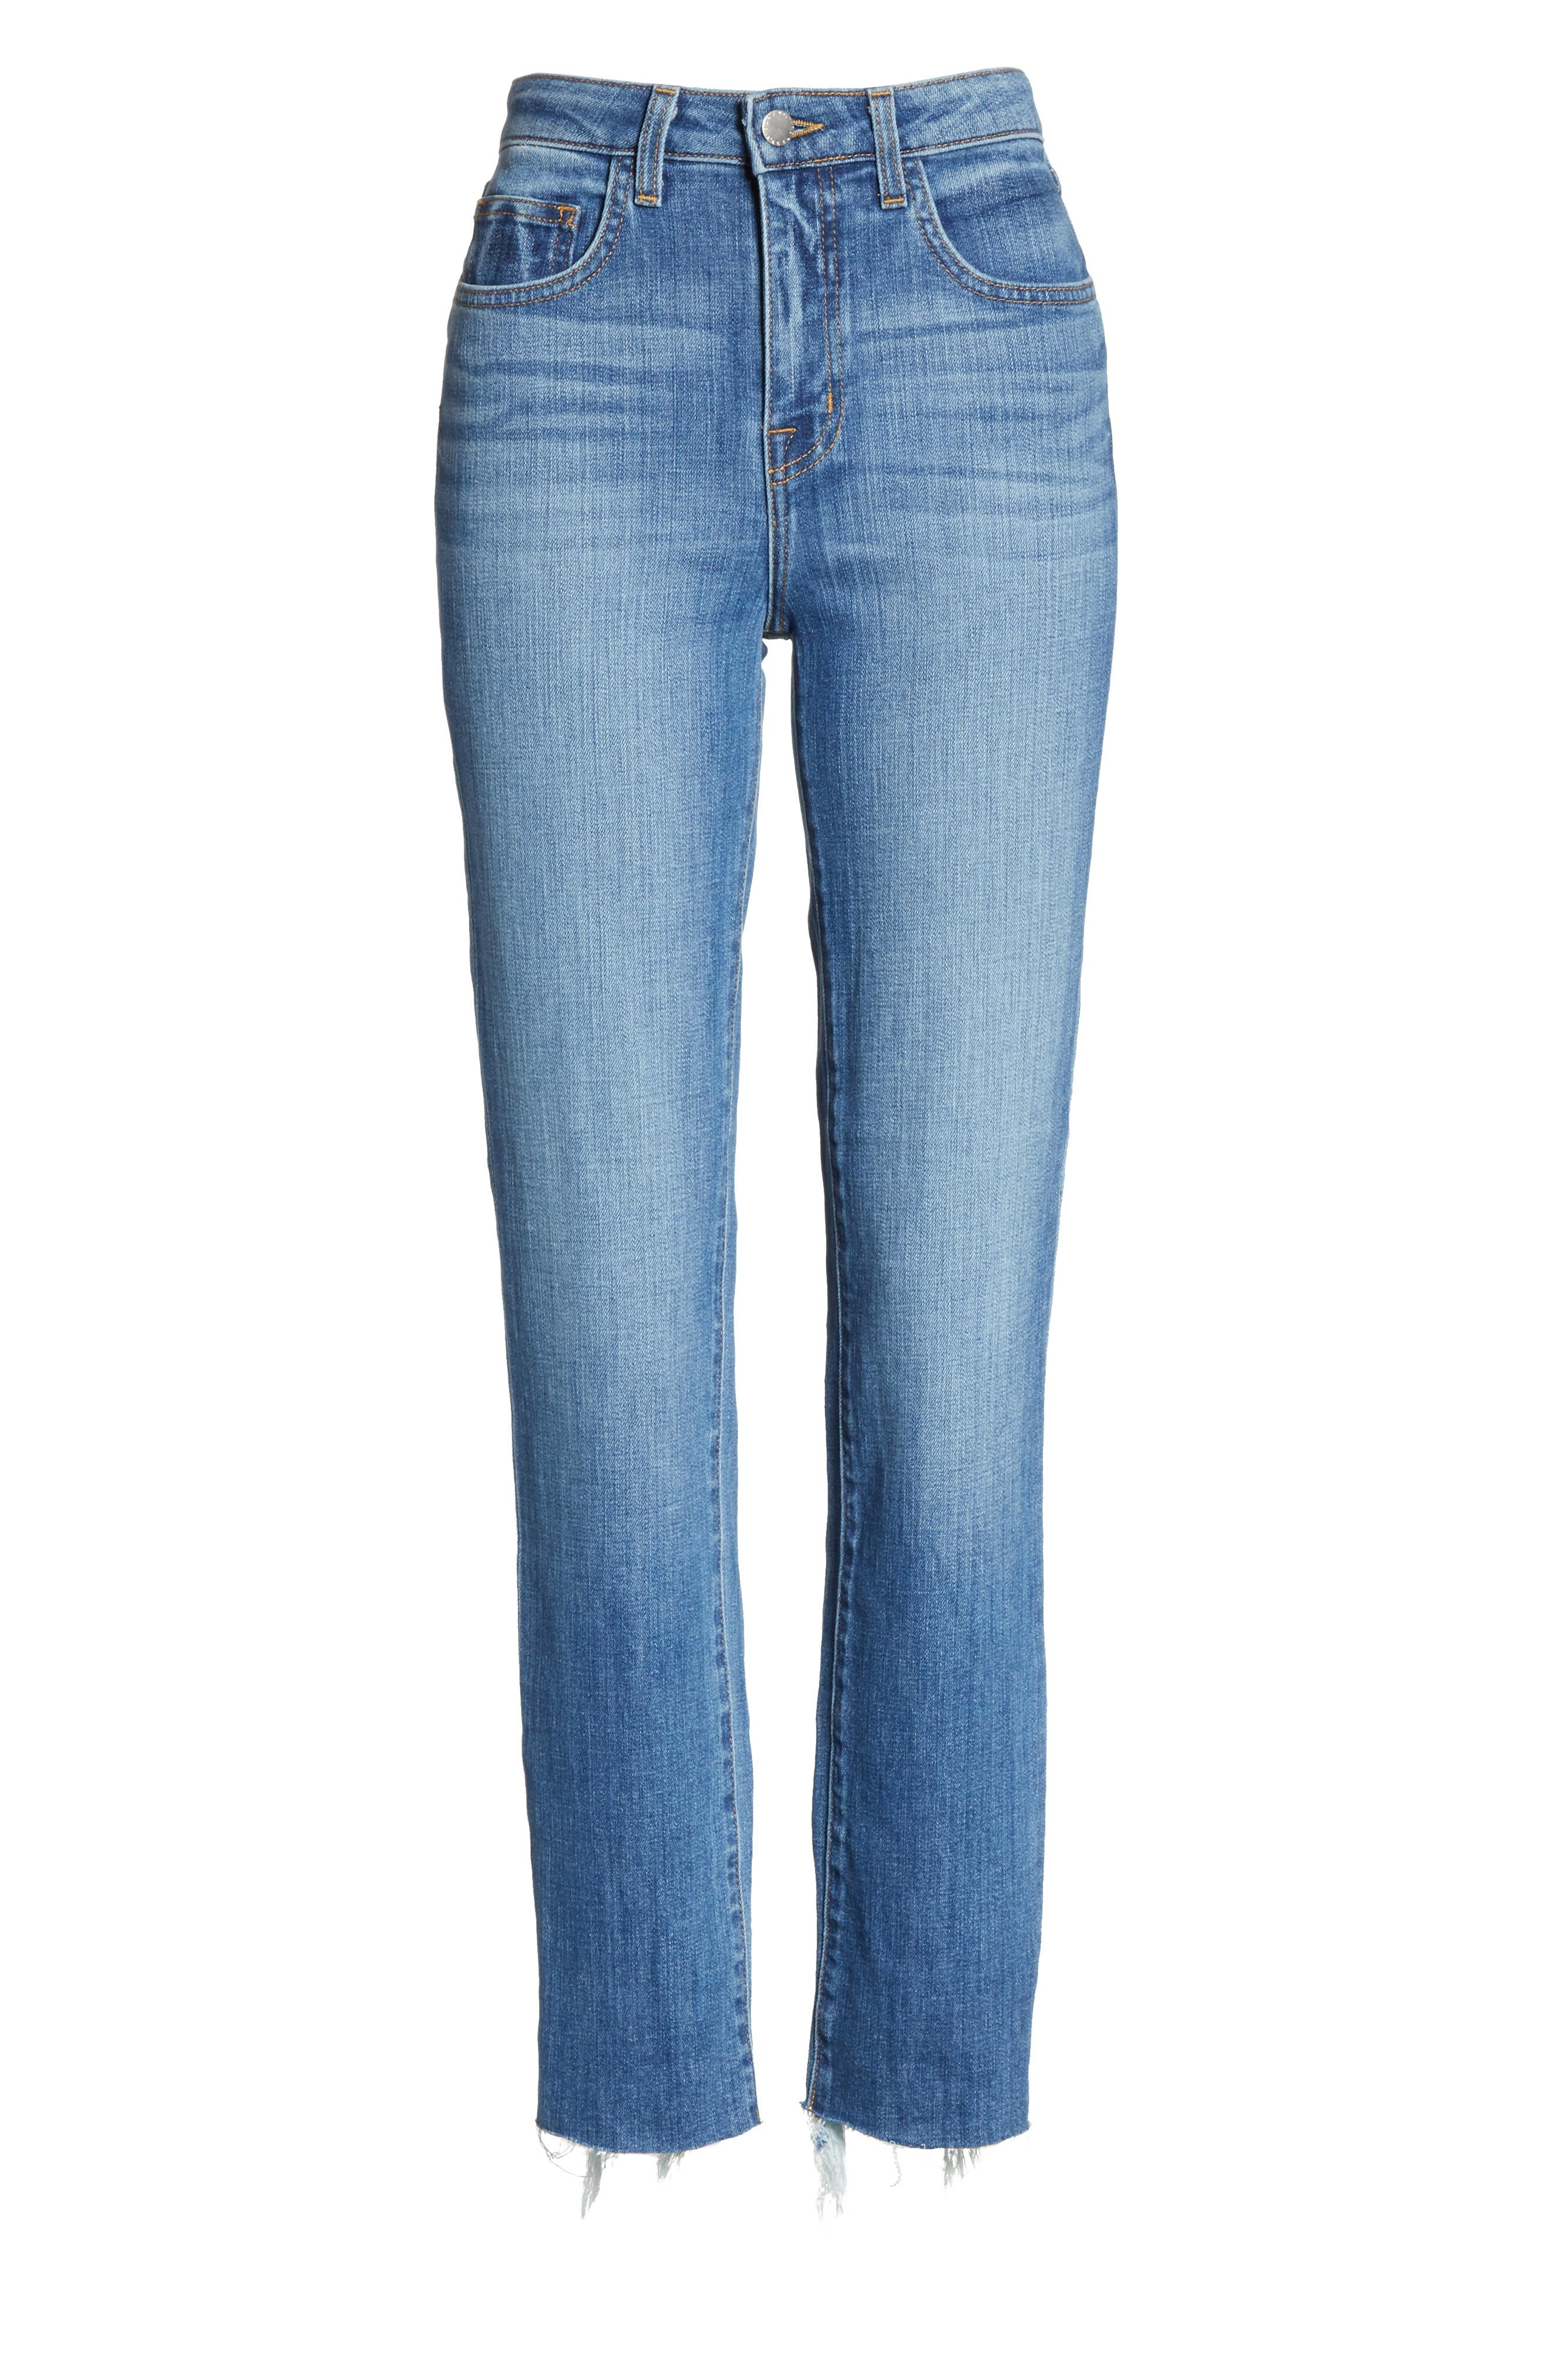 Lorelei High Waist Slim Straight Jeans,                             Alternate thumbnail 7, color,                             450